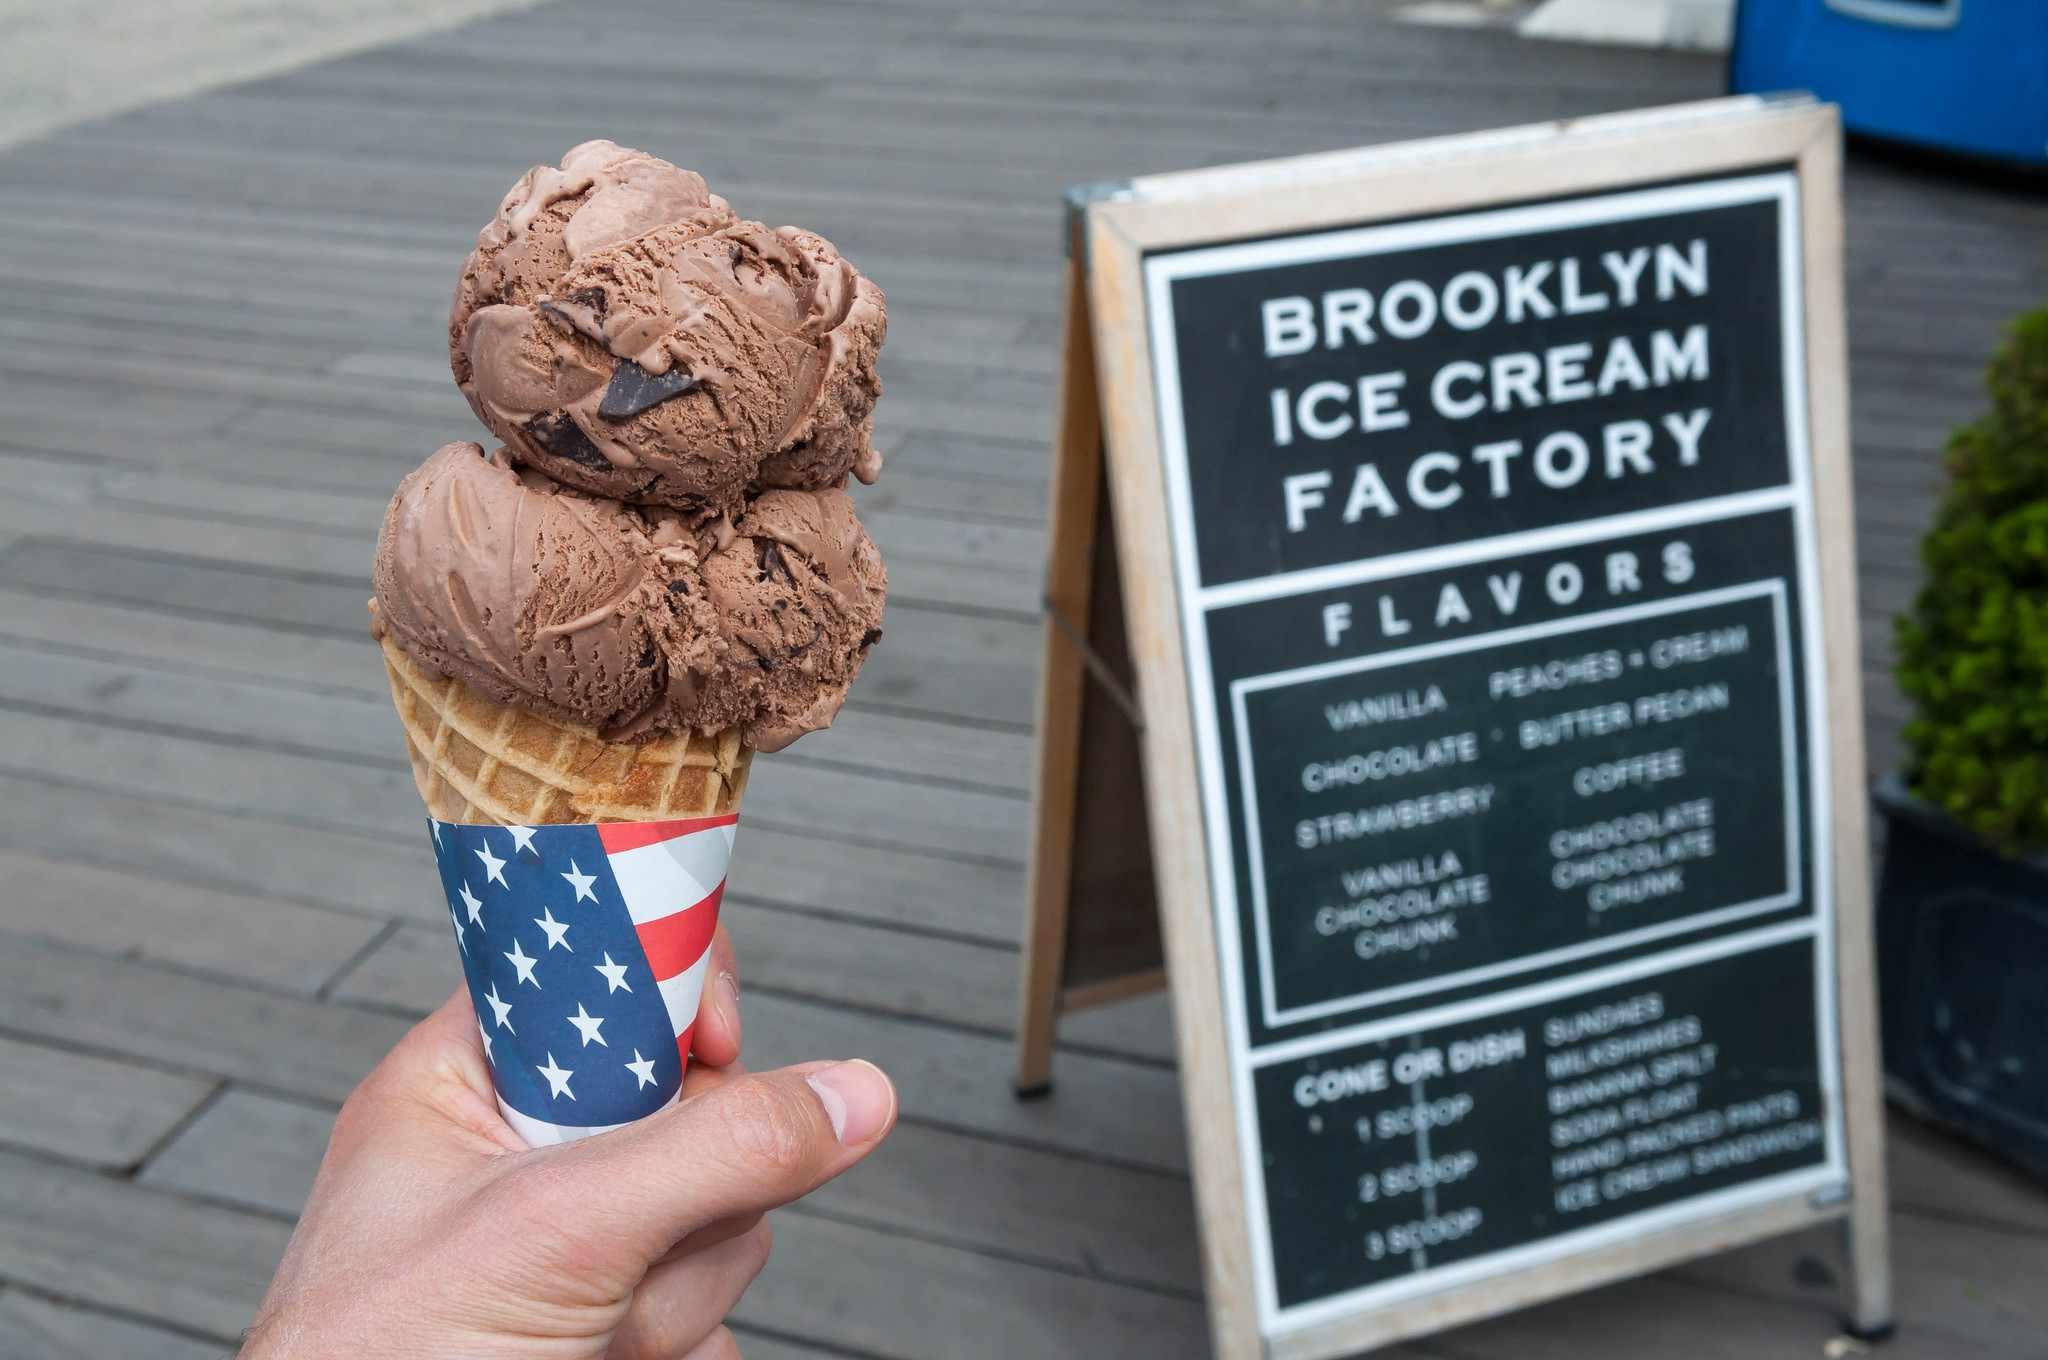 Brookyln Ice Cream Factory